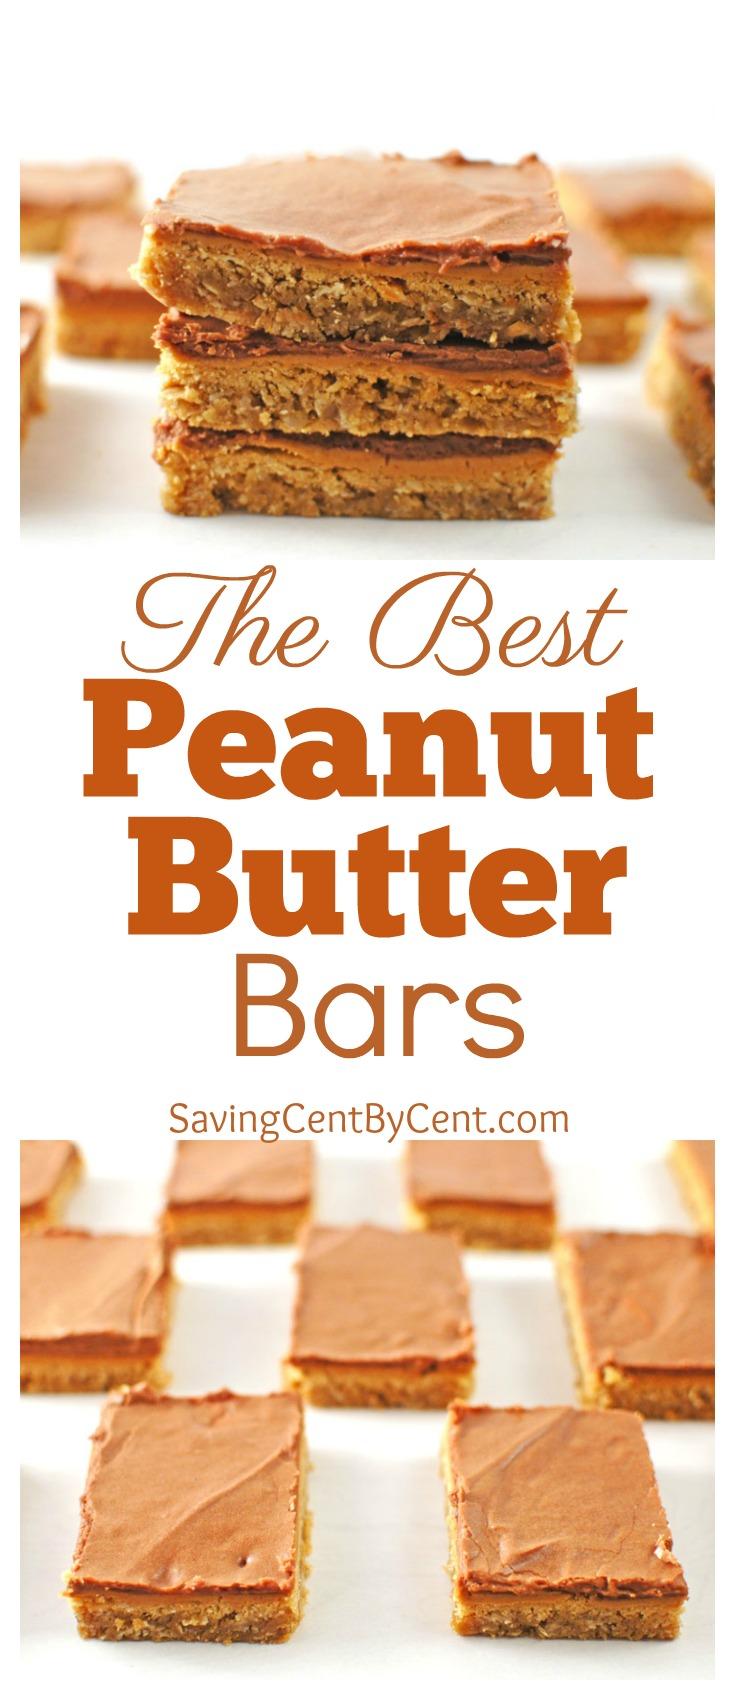 The Best Peanut Butter Bars